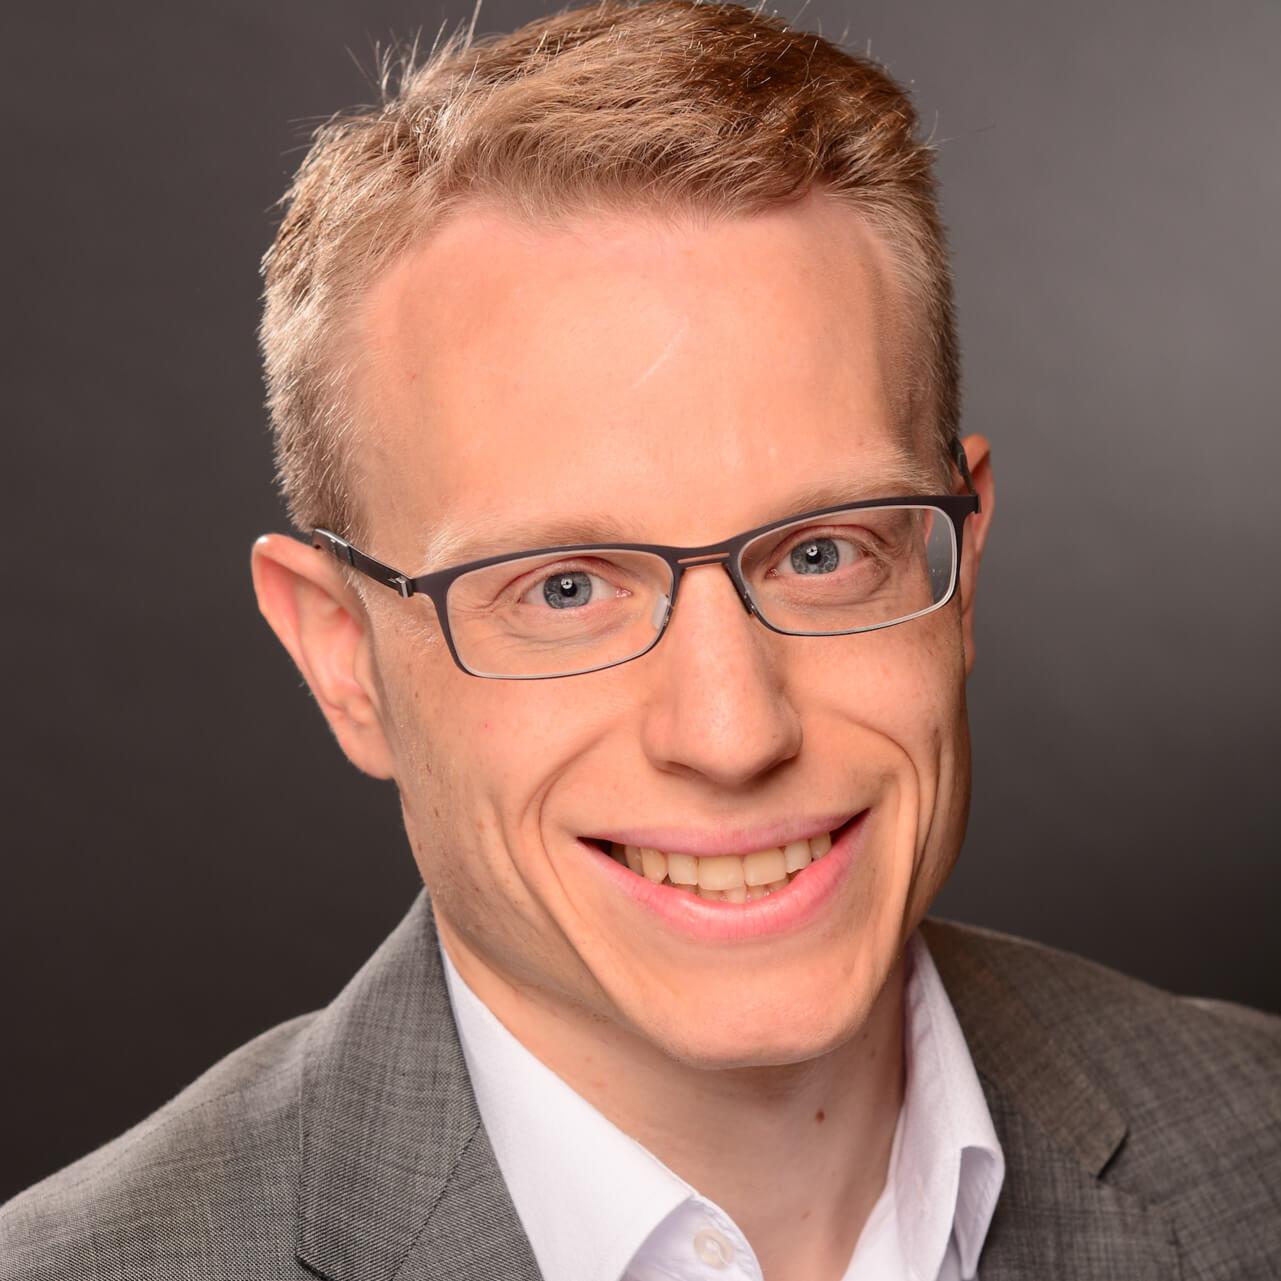 Dr.-Ing. Erik Esche